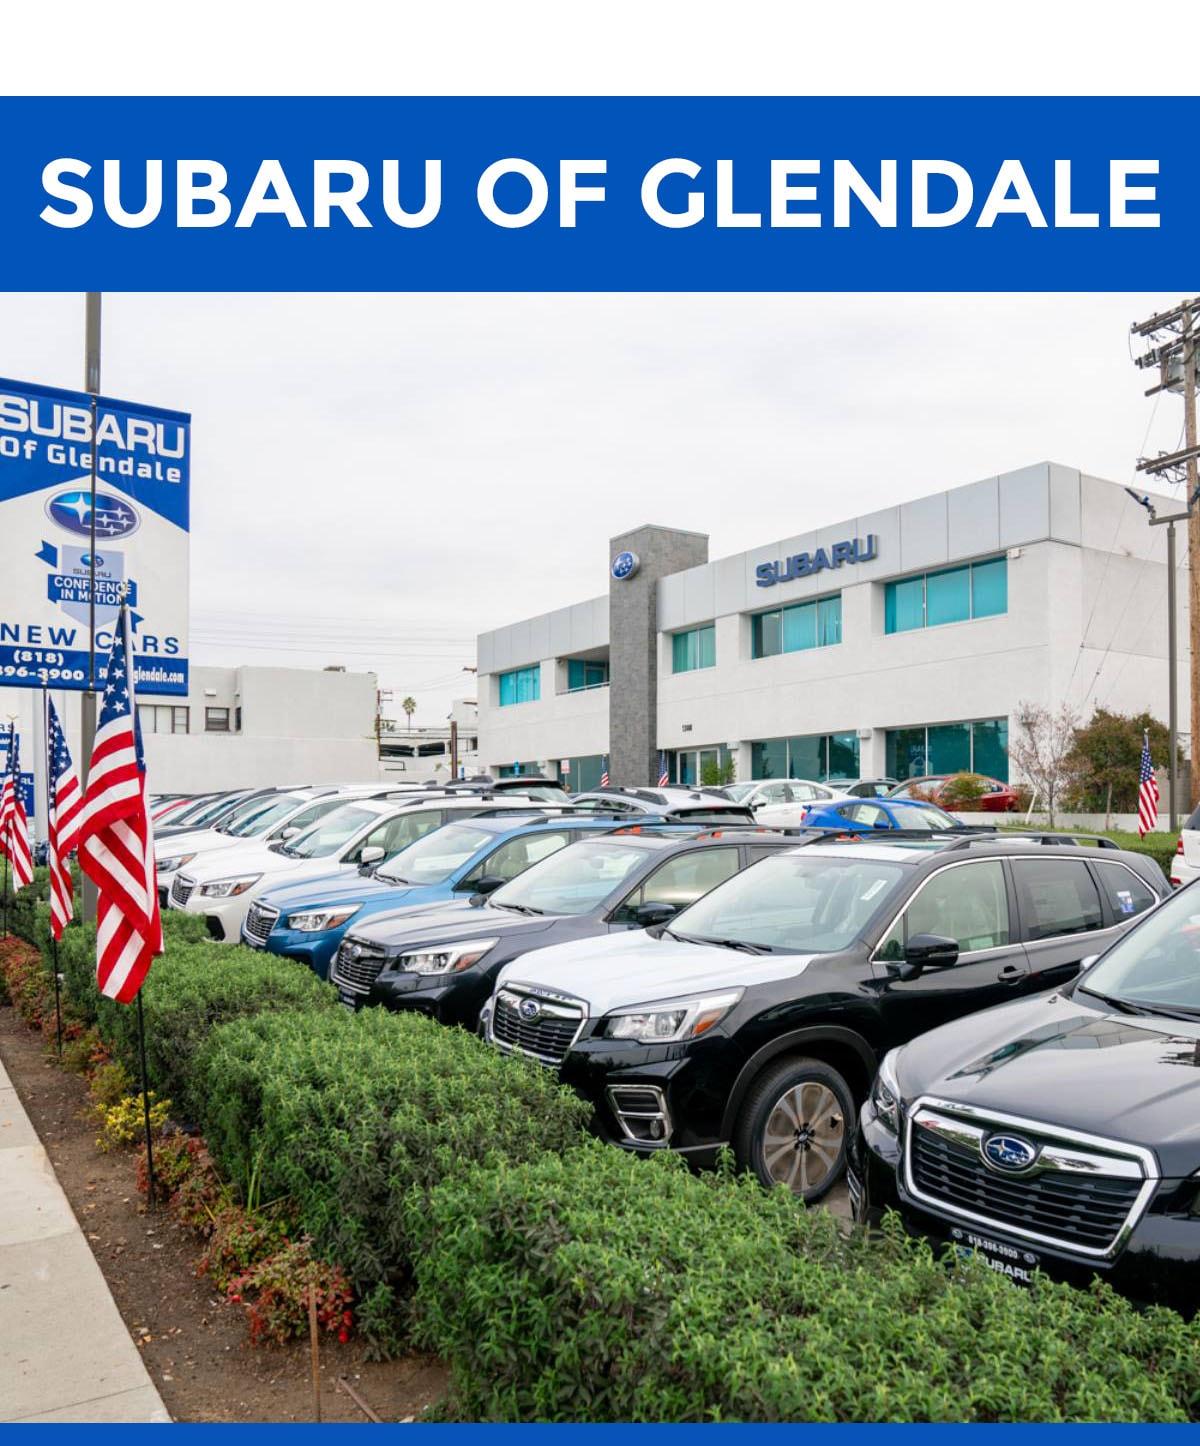 California's #1 Subaru Retailer